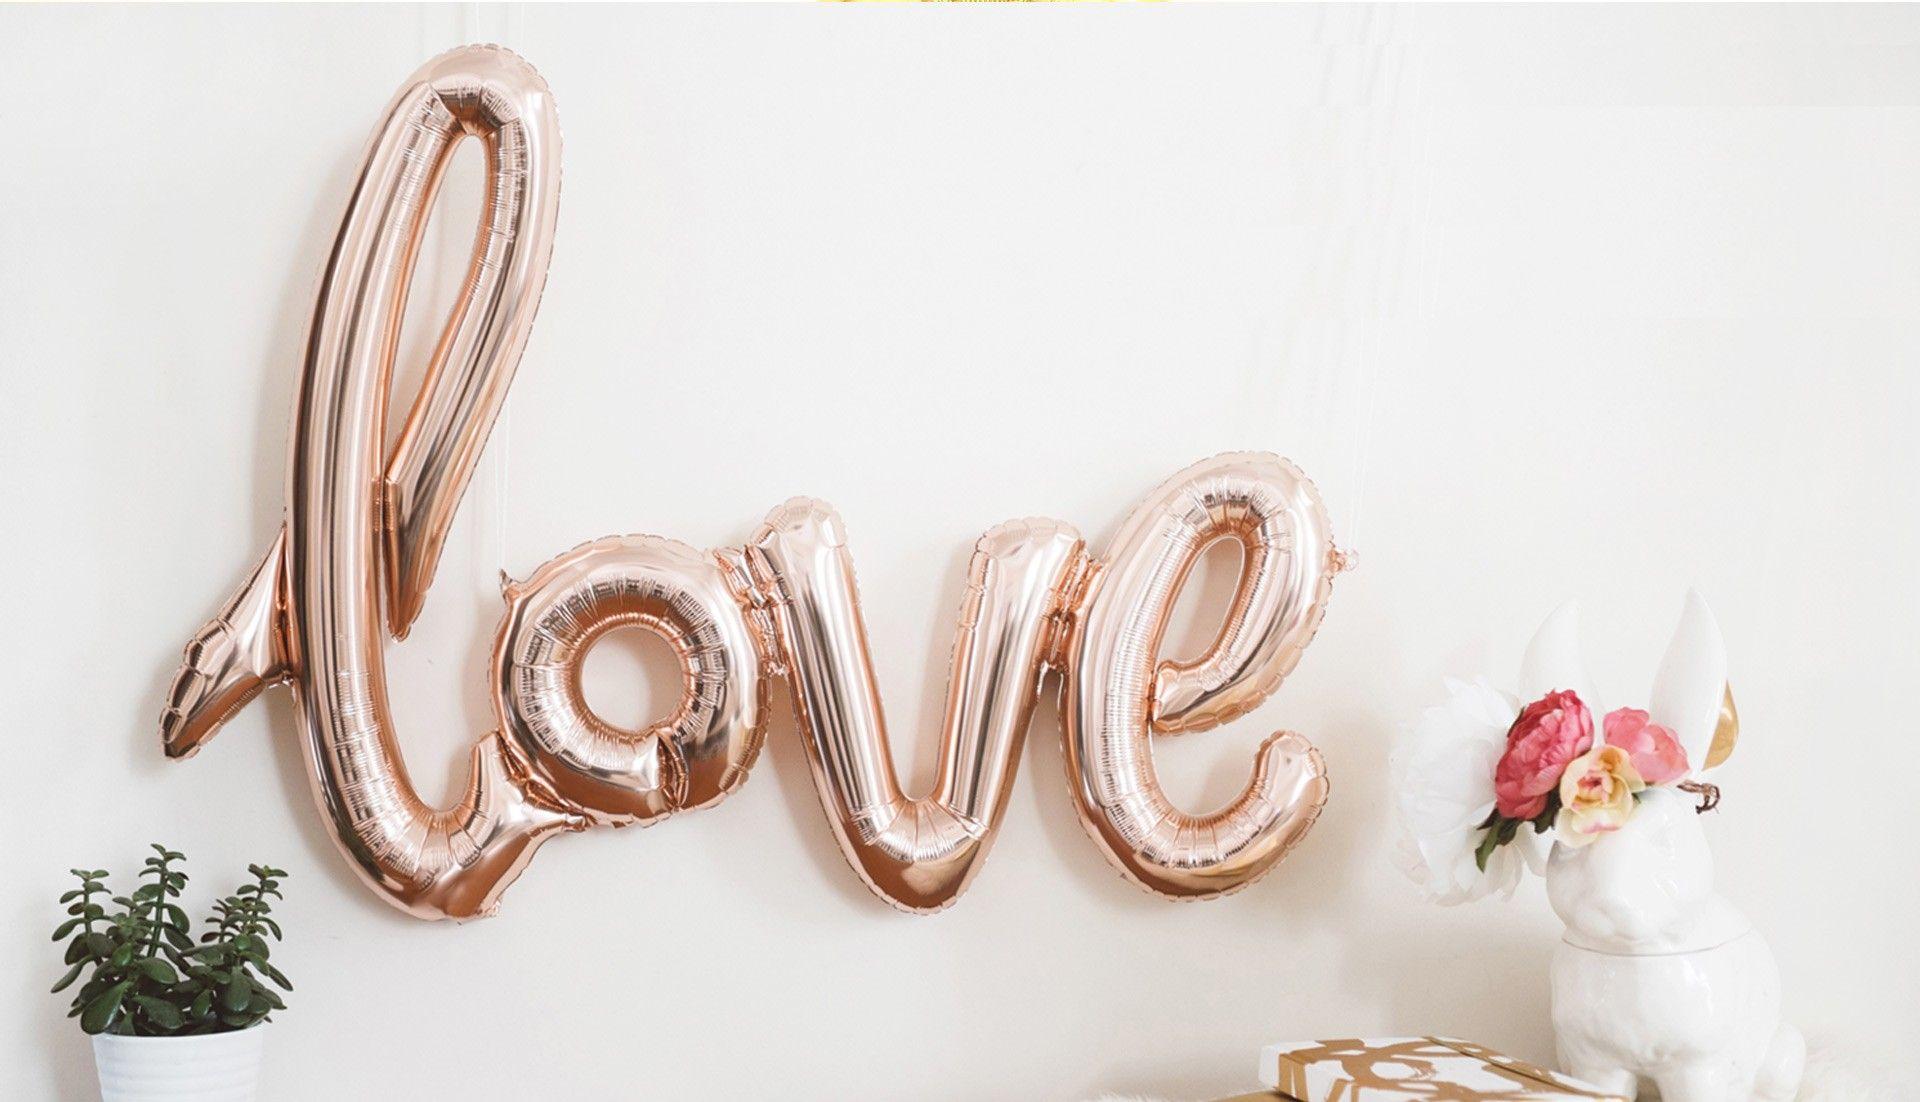 Großformatige Botschaften Namen des Brautpaares